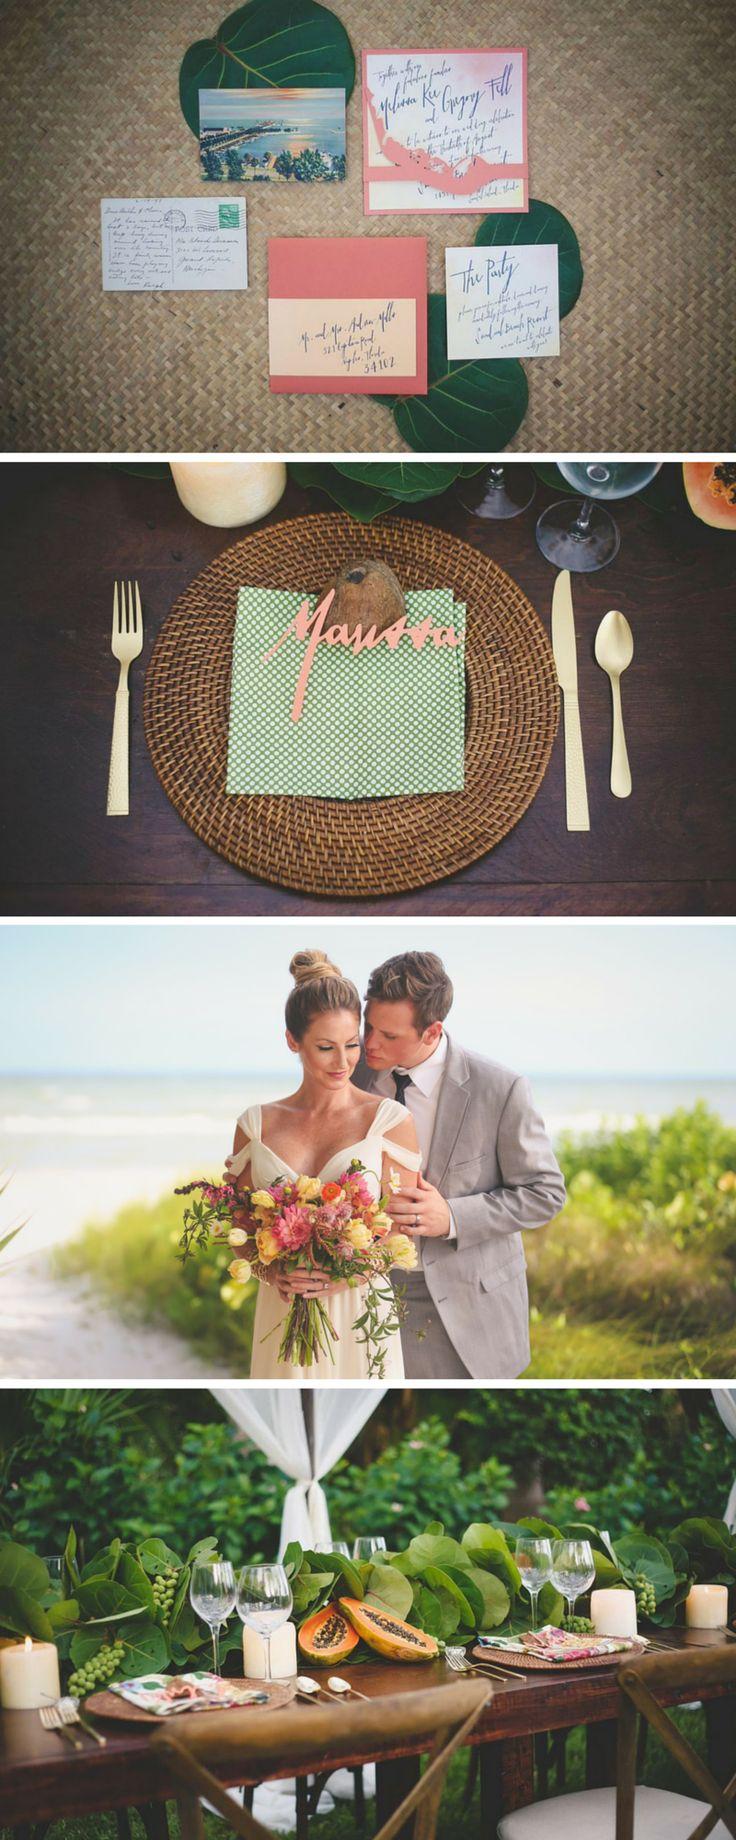 Coastal Wedding Invitation with a Tahitian-style theme - Sundial Beach Resort & Spa - Beach Wedding Invites | Sanibel Island Wedding